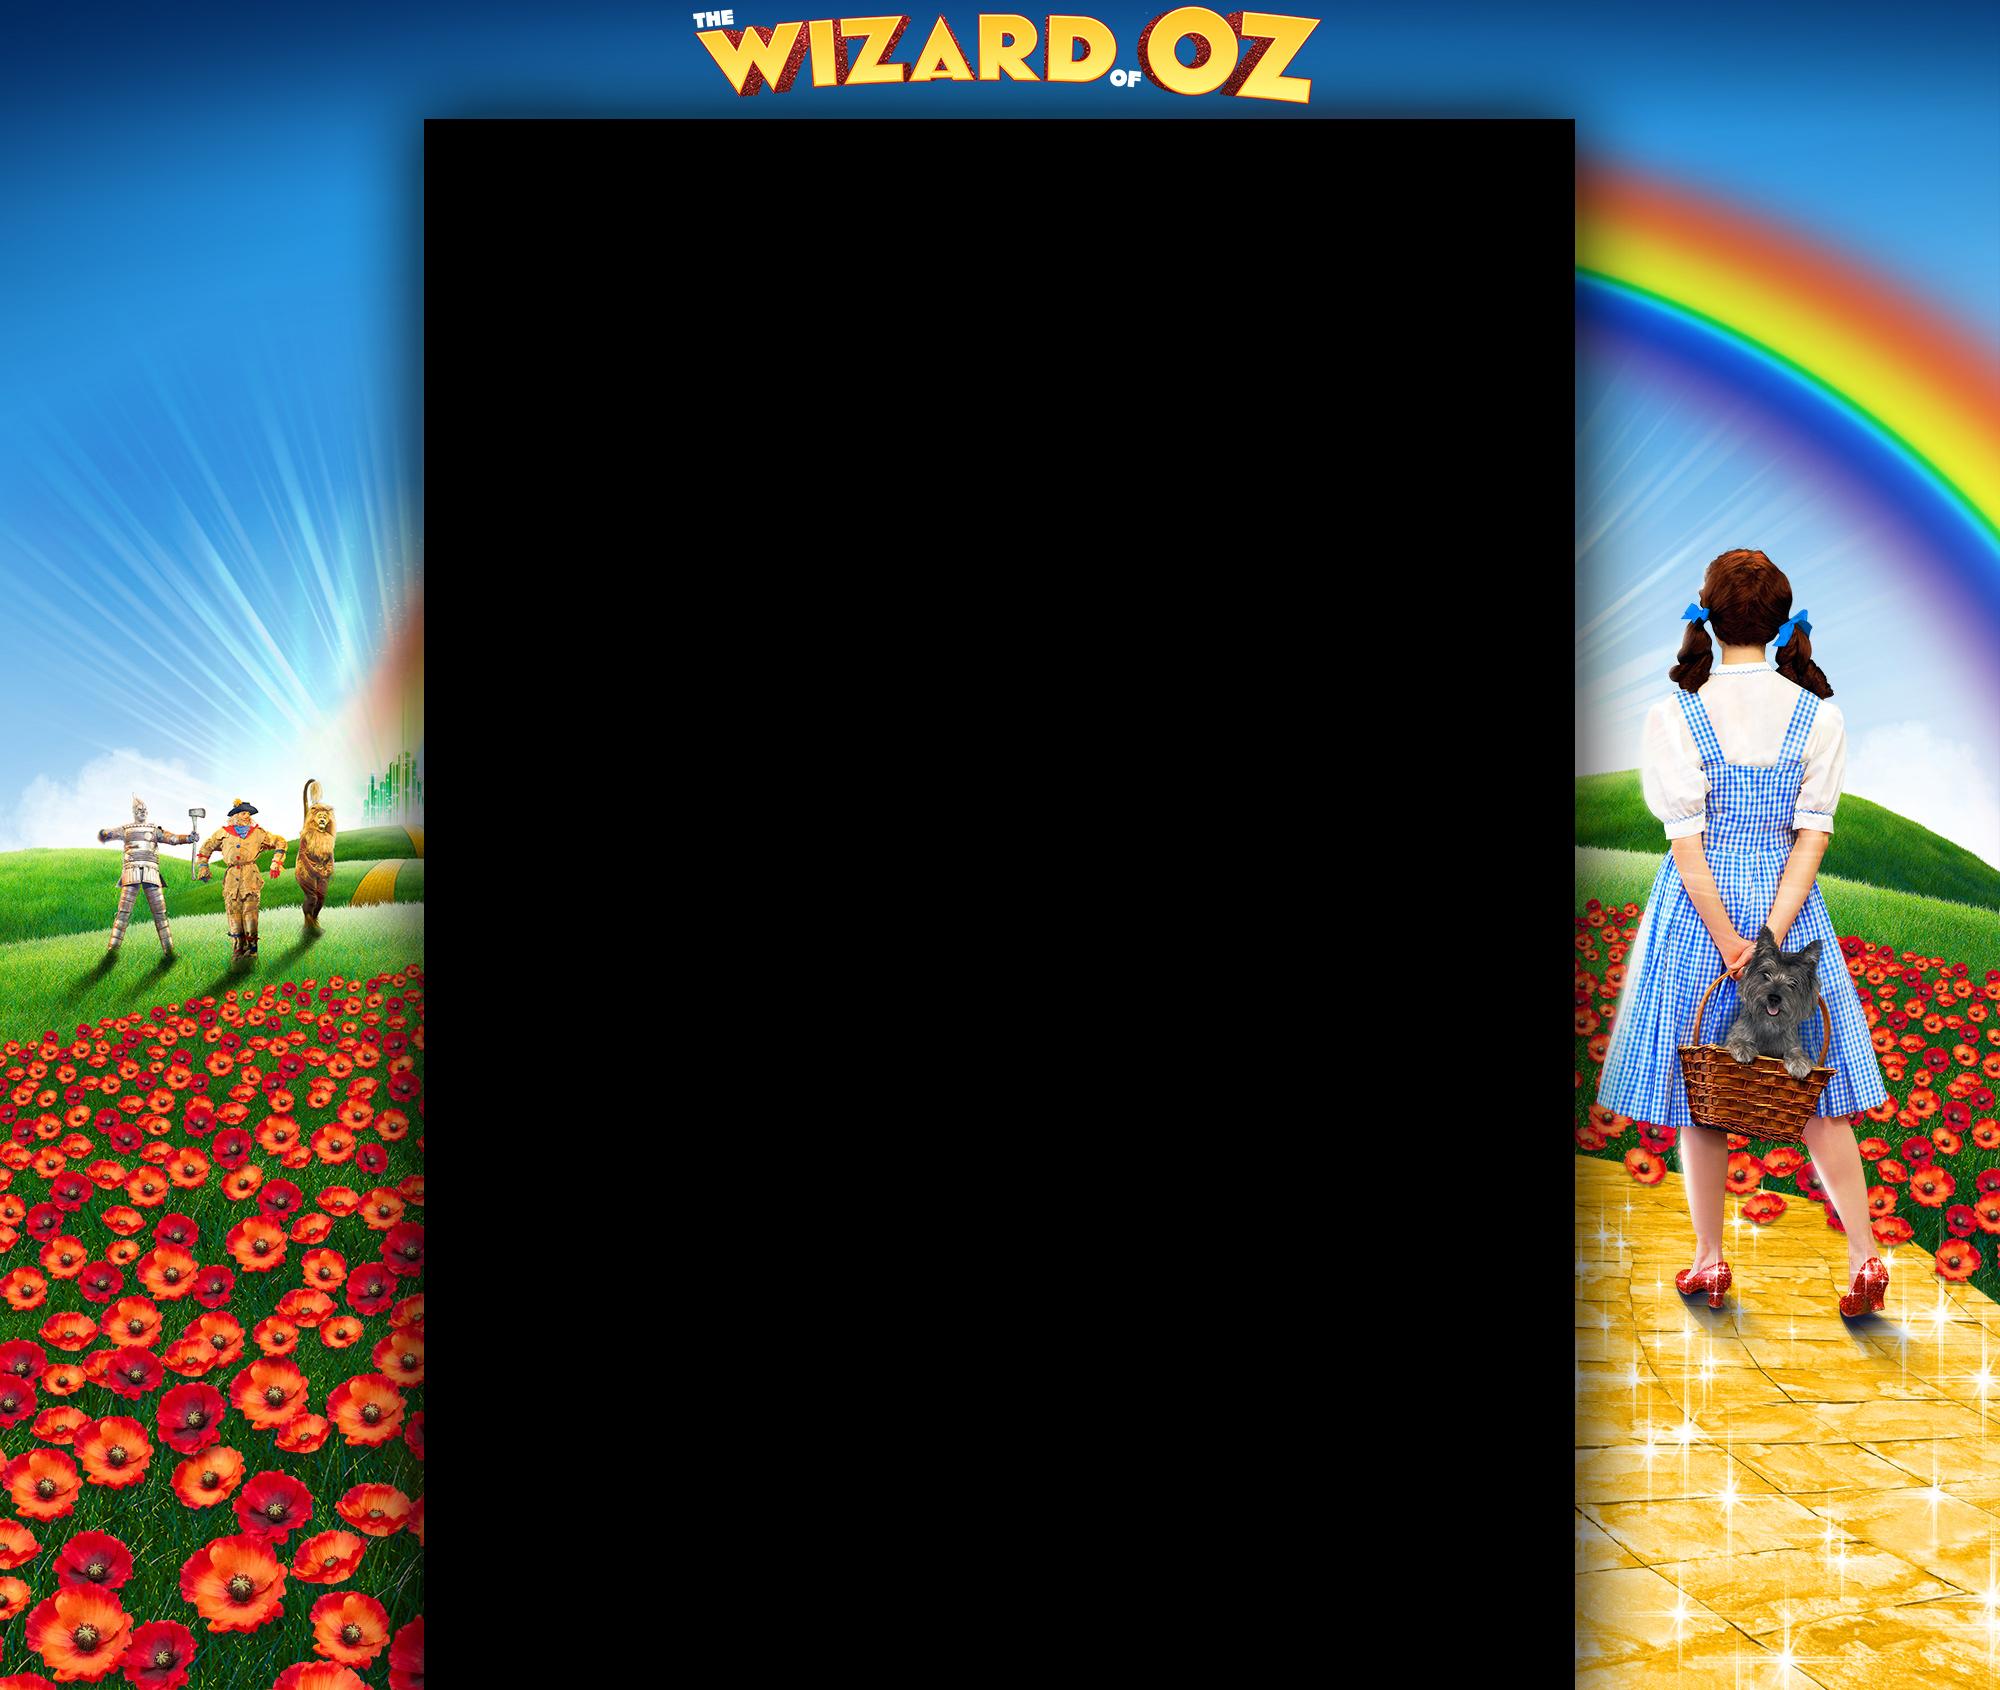 woz-au-background.jpg